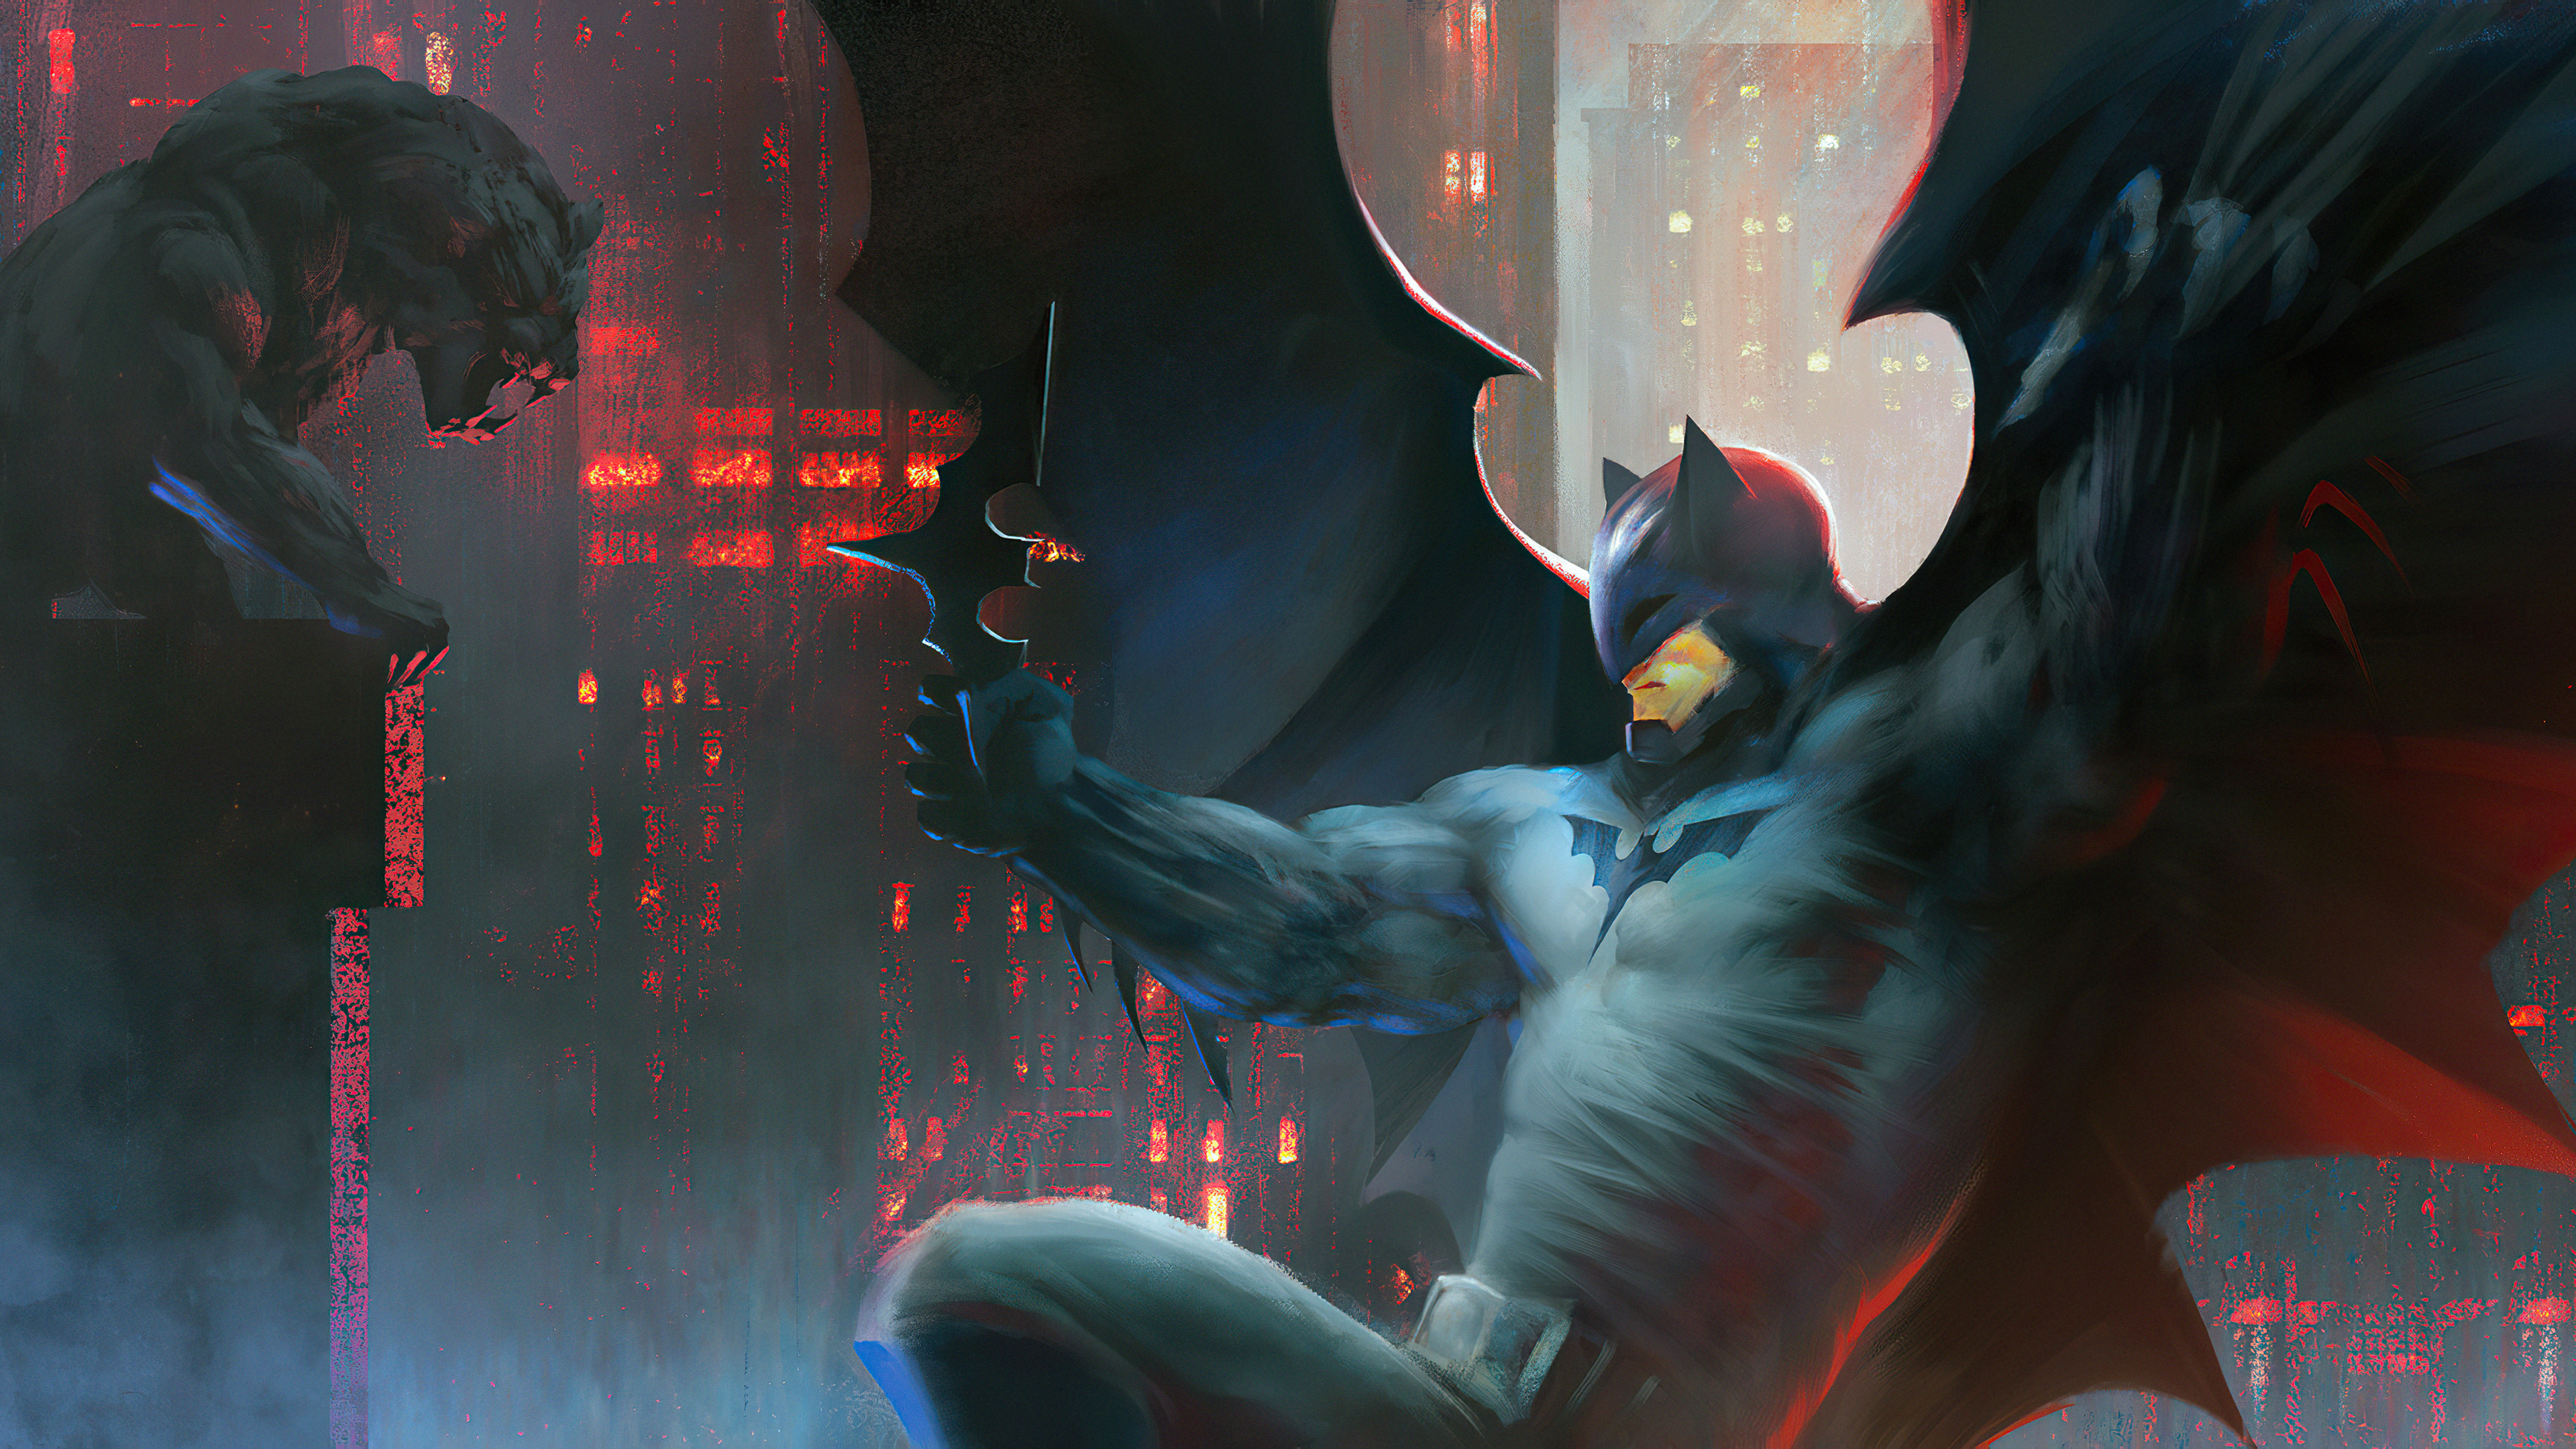 batman new sketch art 1572368664 - Batman New Sketch Art - superheroes wallpapers, portrait wallpapers, hd-wallpapers, batman wallpapers, artwork wallpapers, 4k-wallpapers